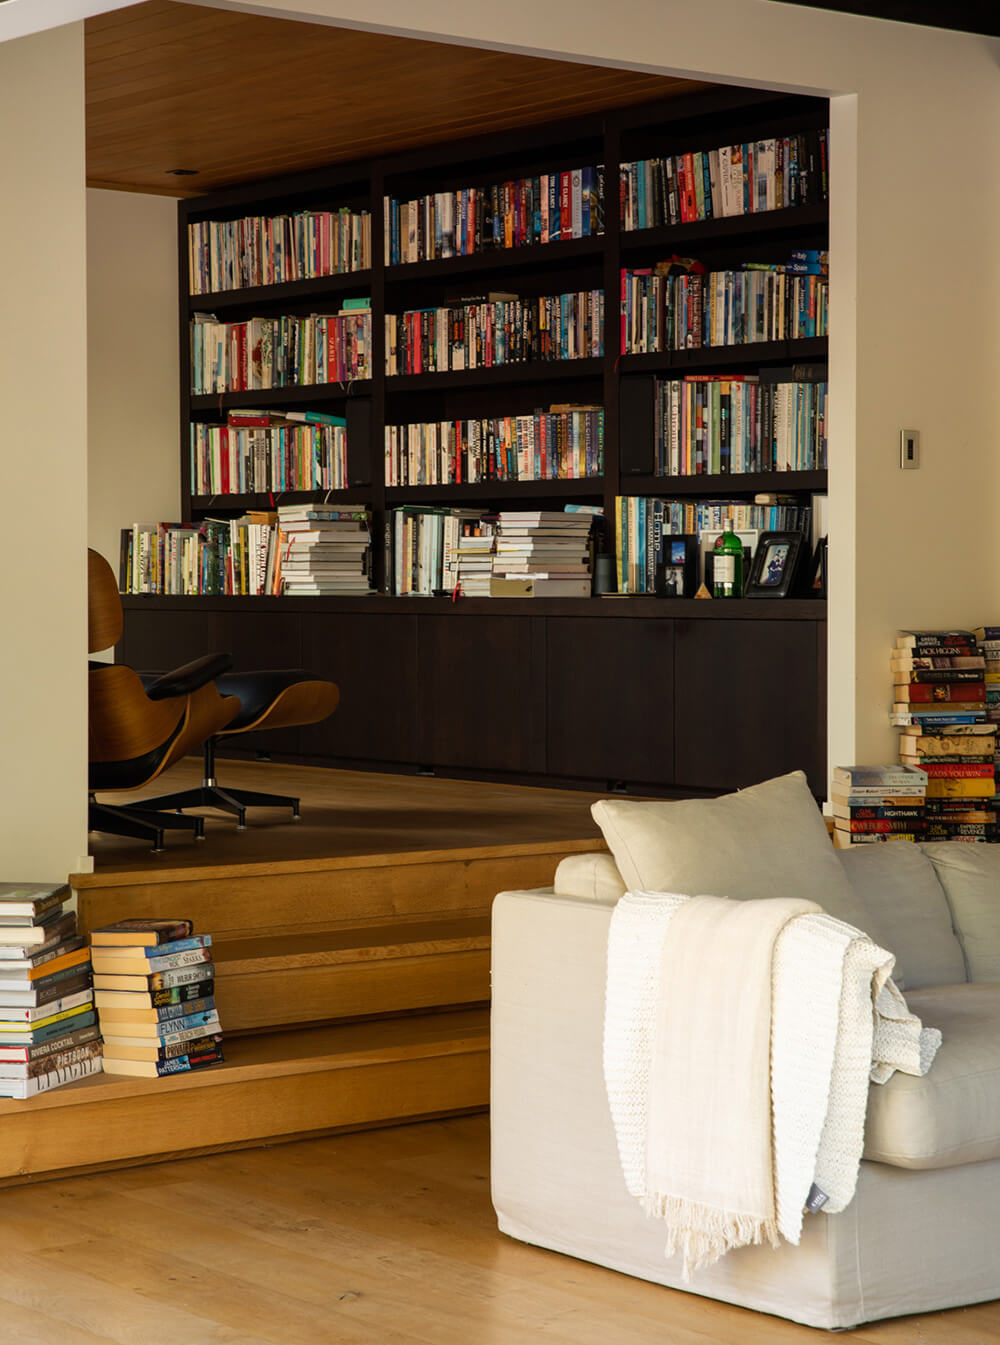 Hamish Cameron Architecture - Remuera rd Bookshelf